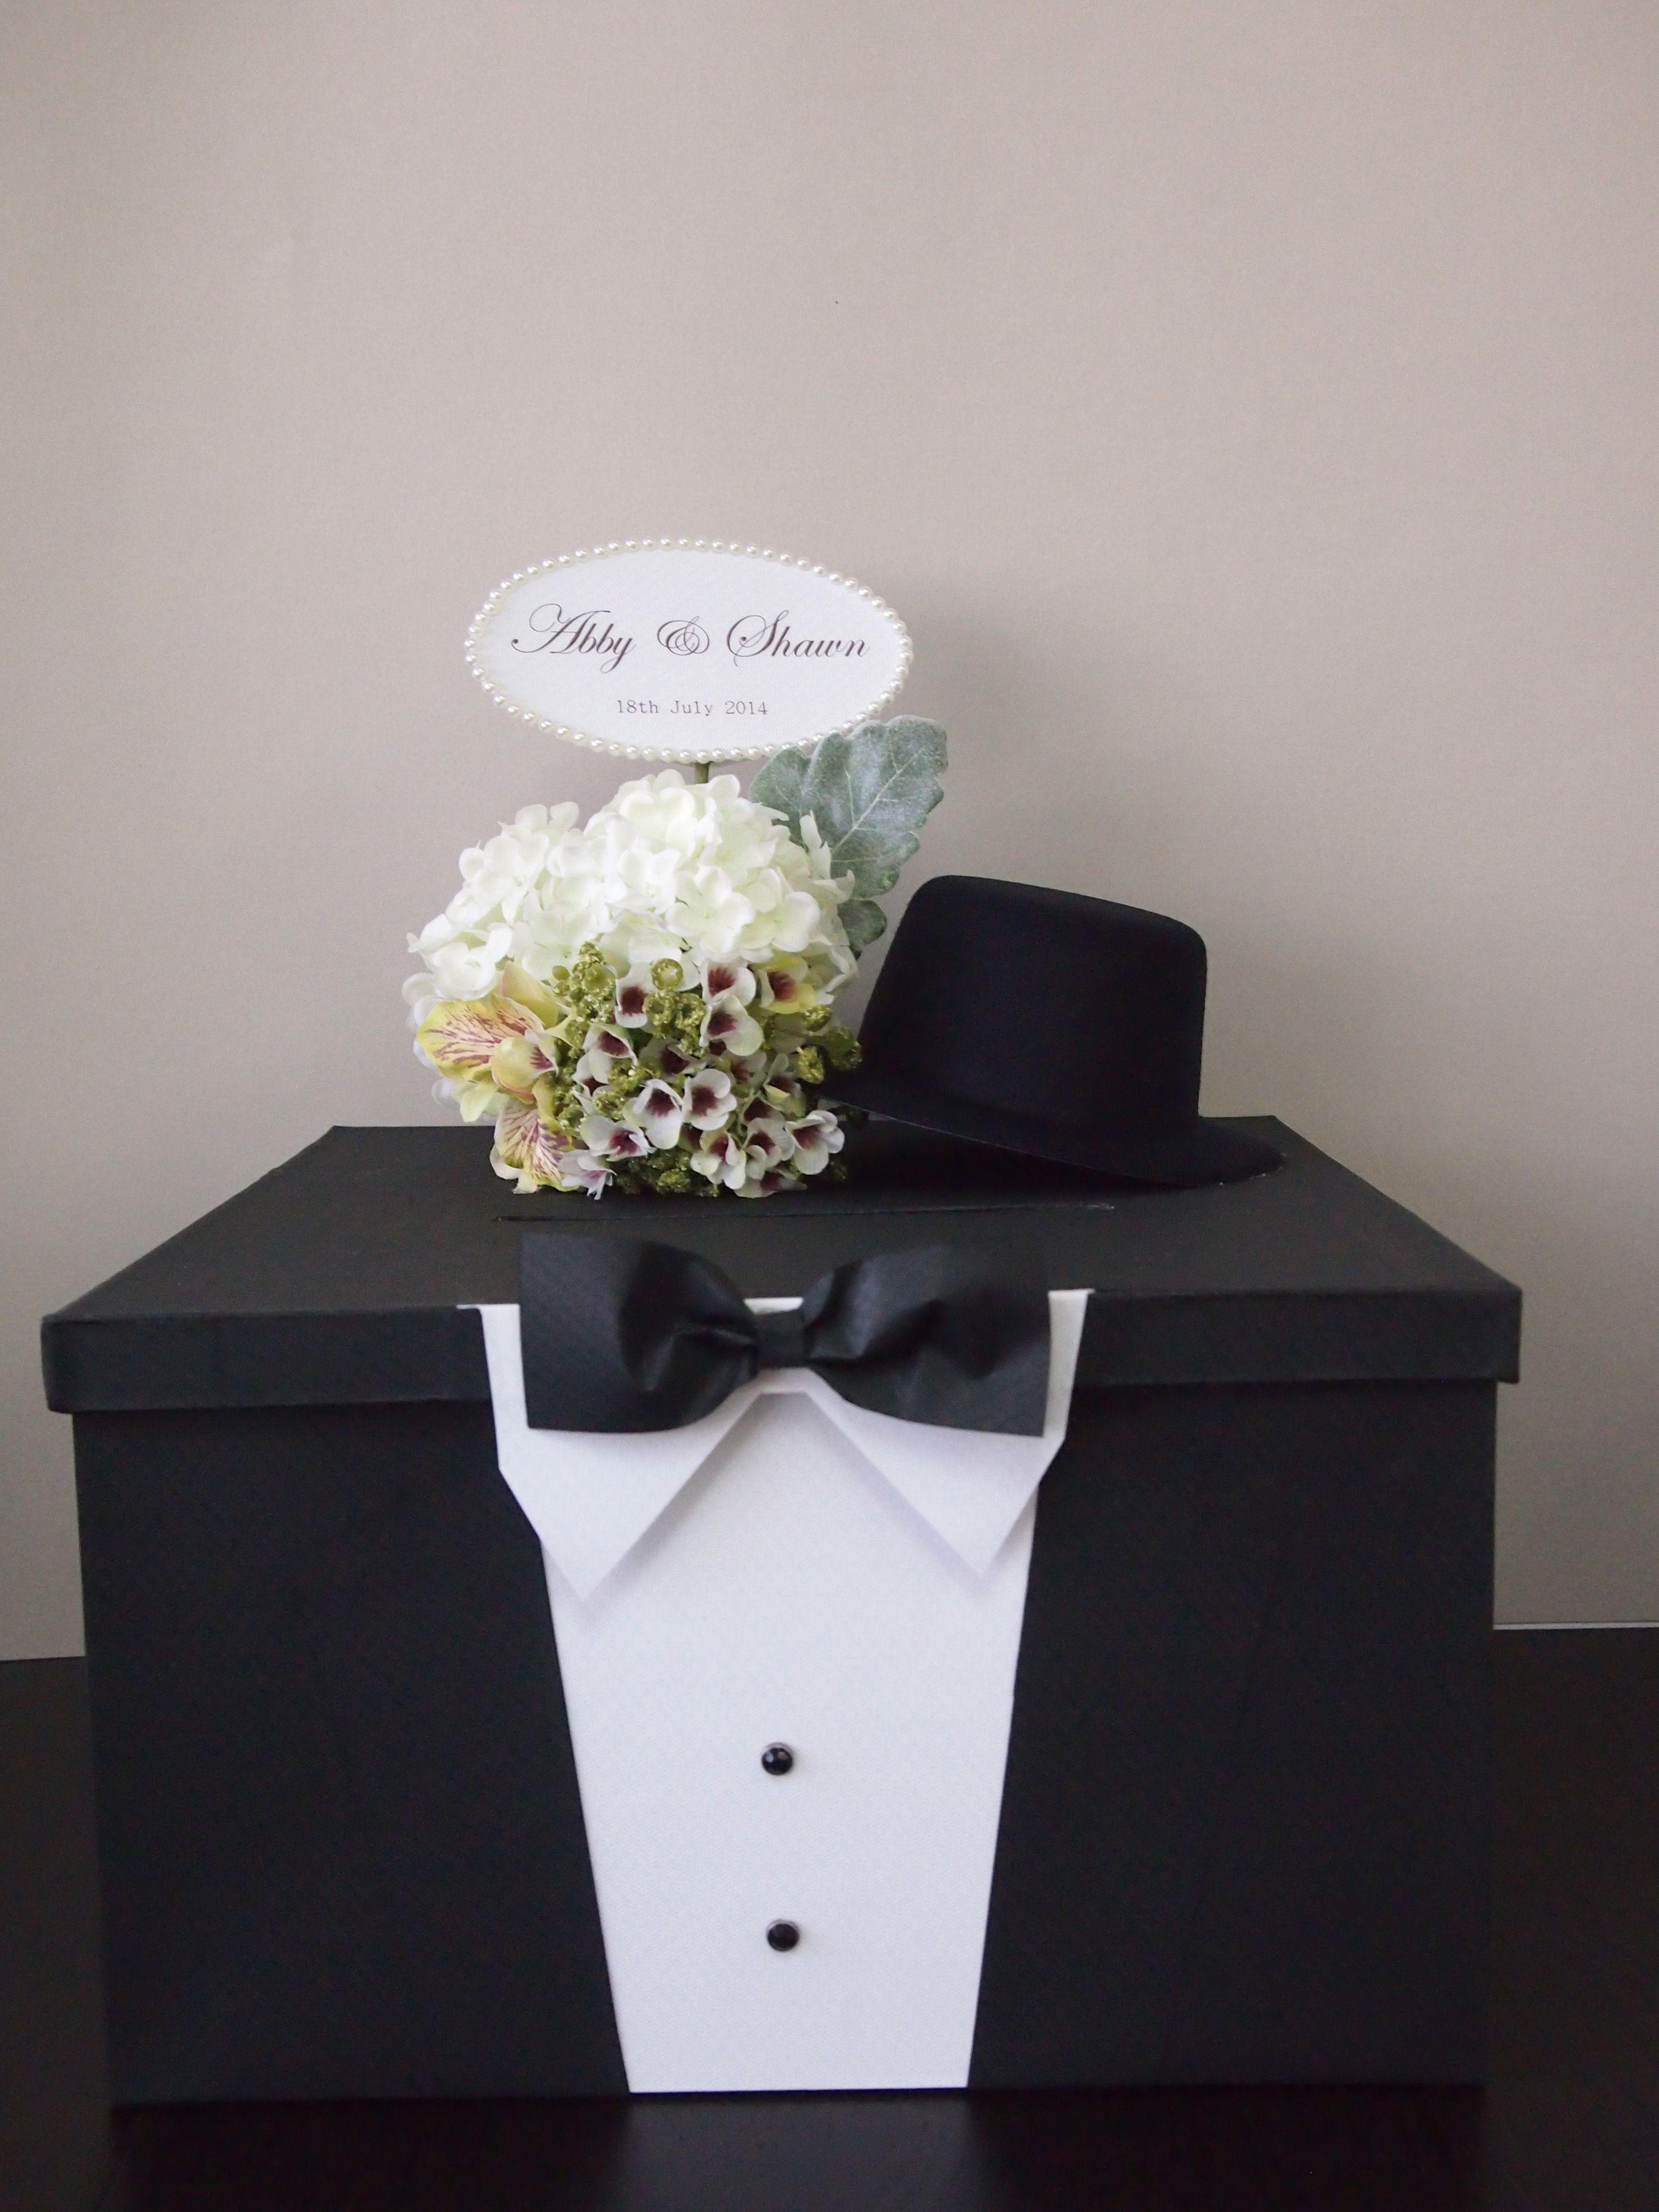 Satin wedding card box with royal blue flower and rhinestone mesh trim - Pegeo Wedding Money Gift Cards Box Set For Groom